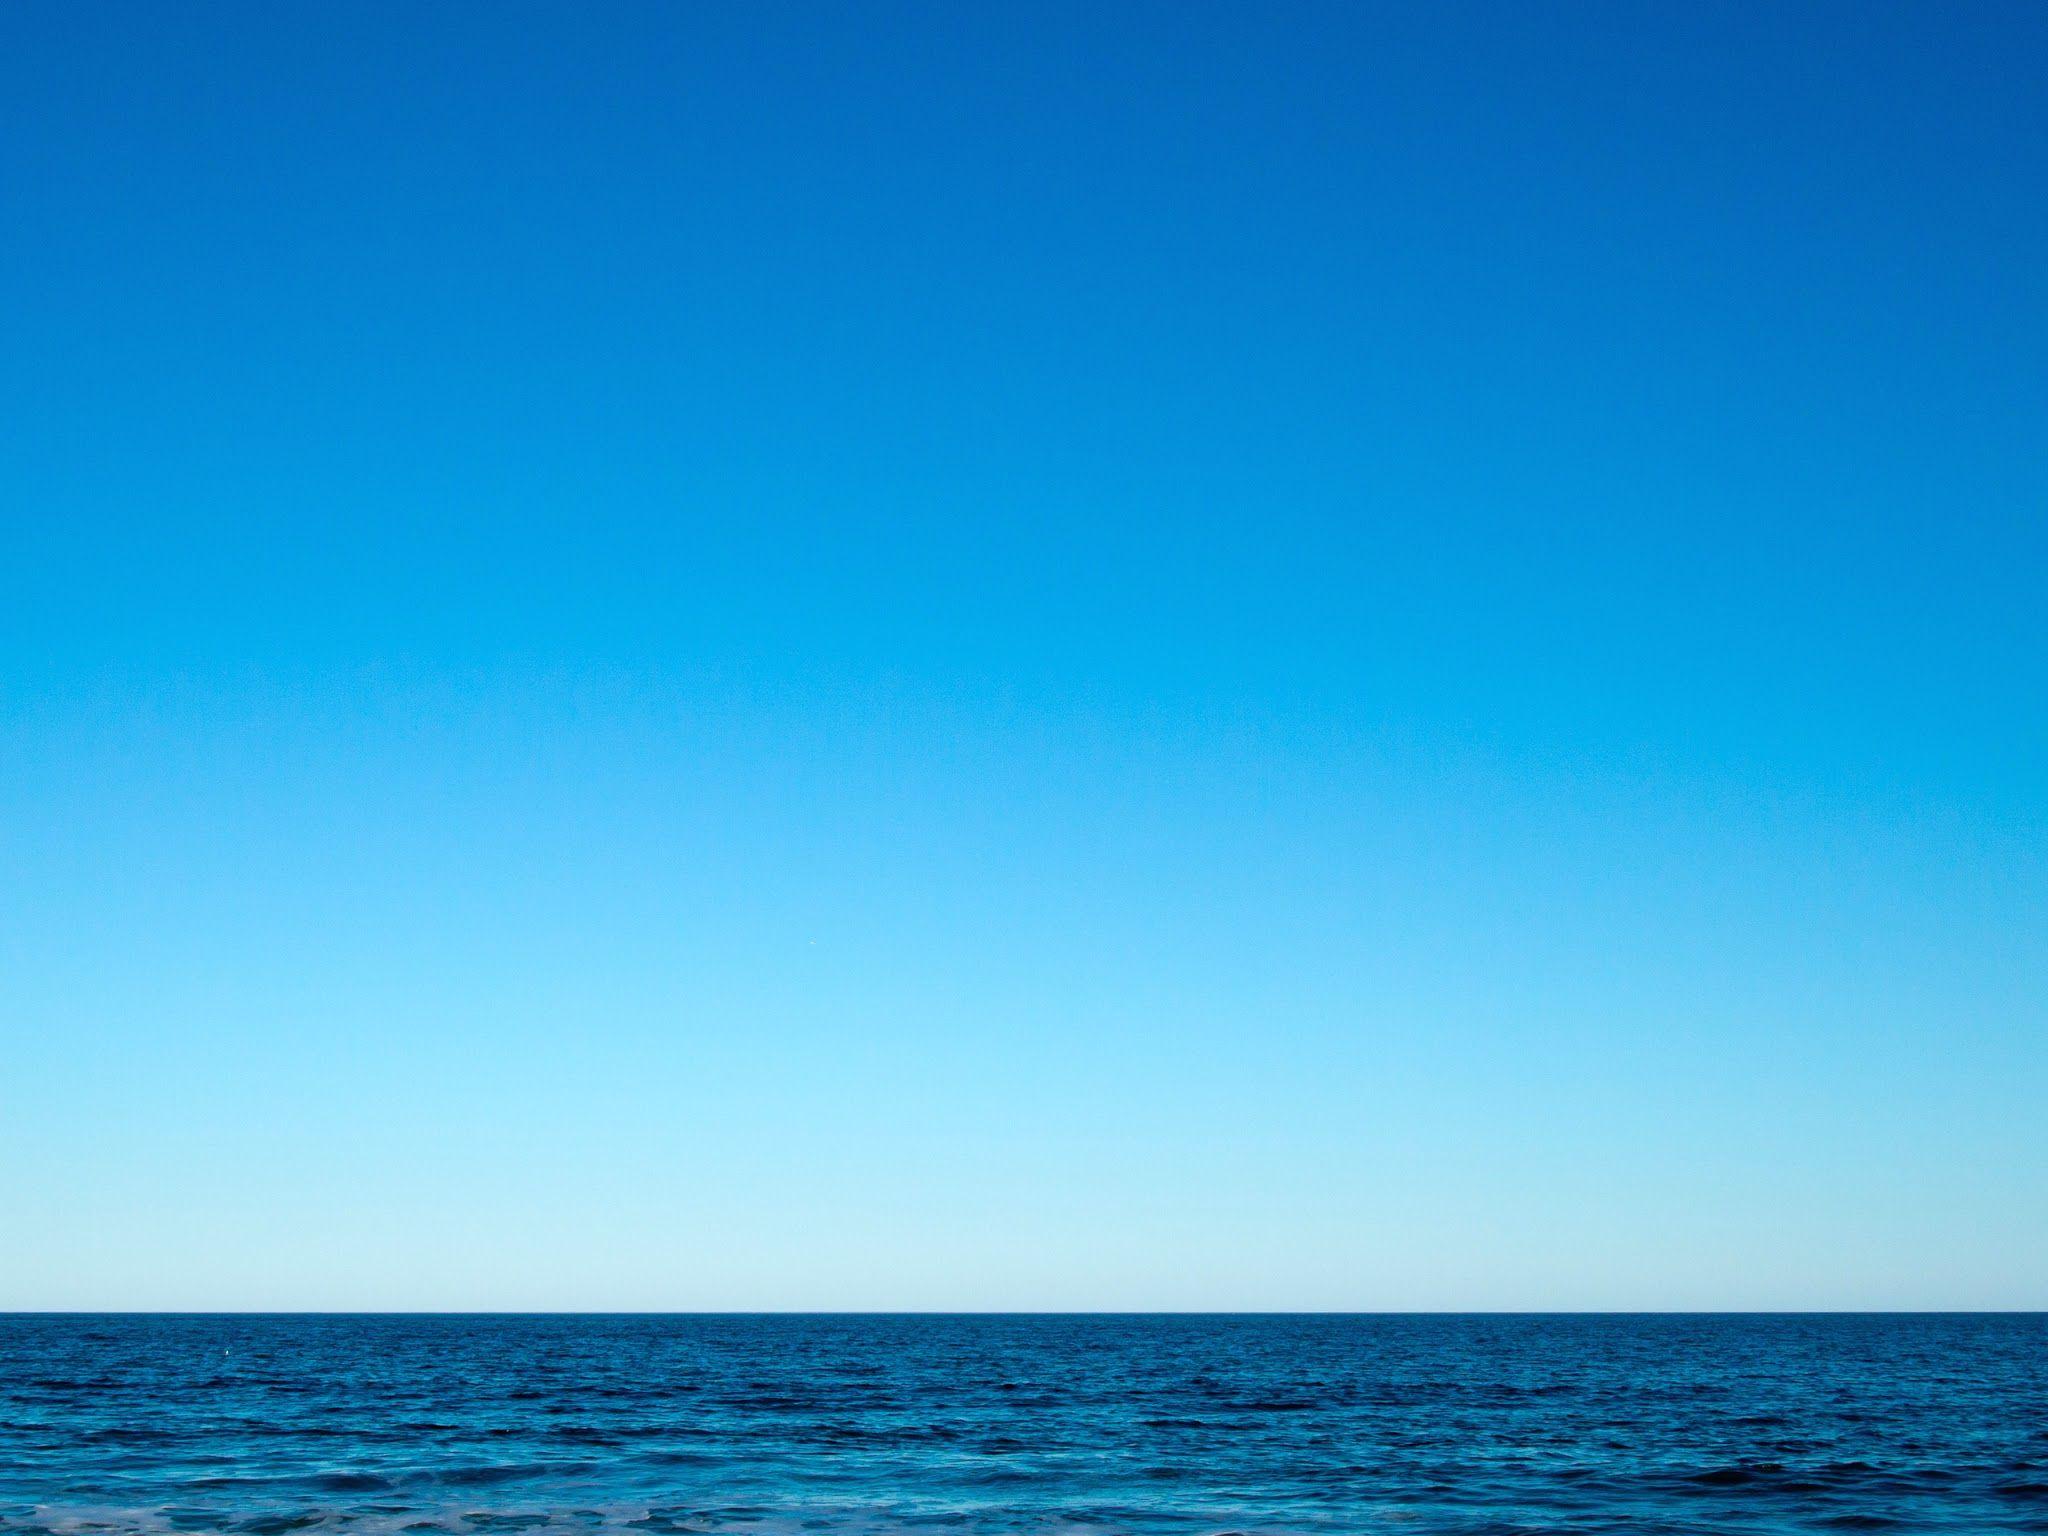 Sea Wallpaper 海 壁紙 海 風景の壁紙